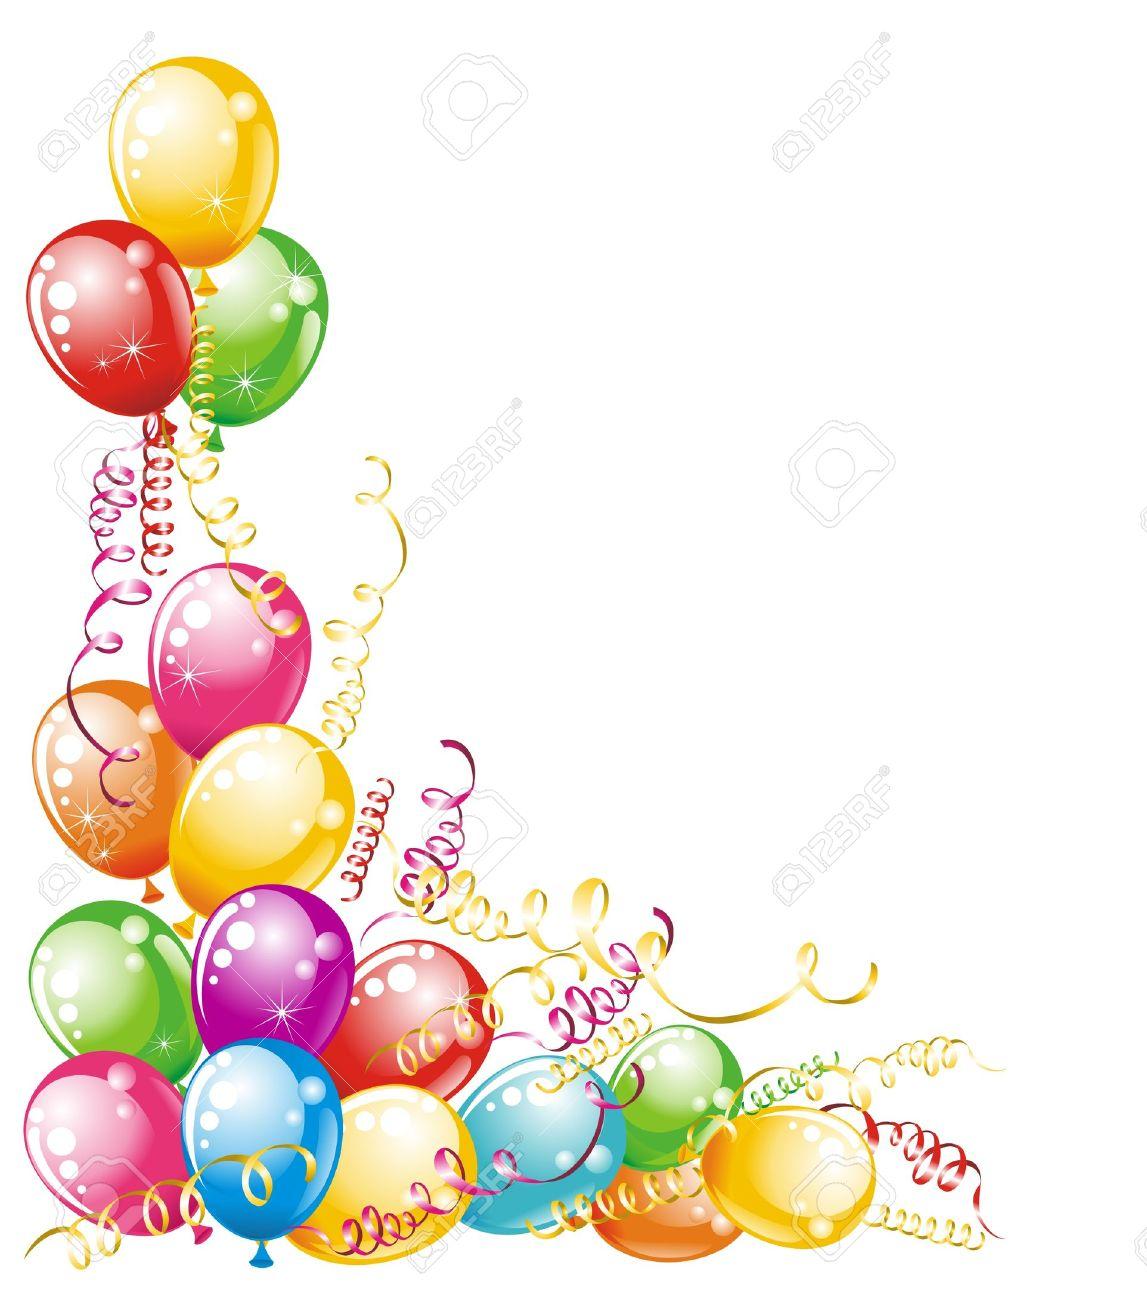 elegant globo helio tarjeta de invitacin para cumpleaos globos de diseo vectores with globos para cumpleaos de nios